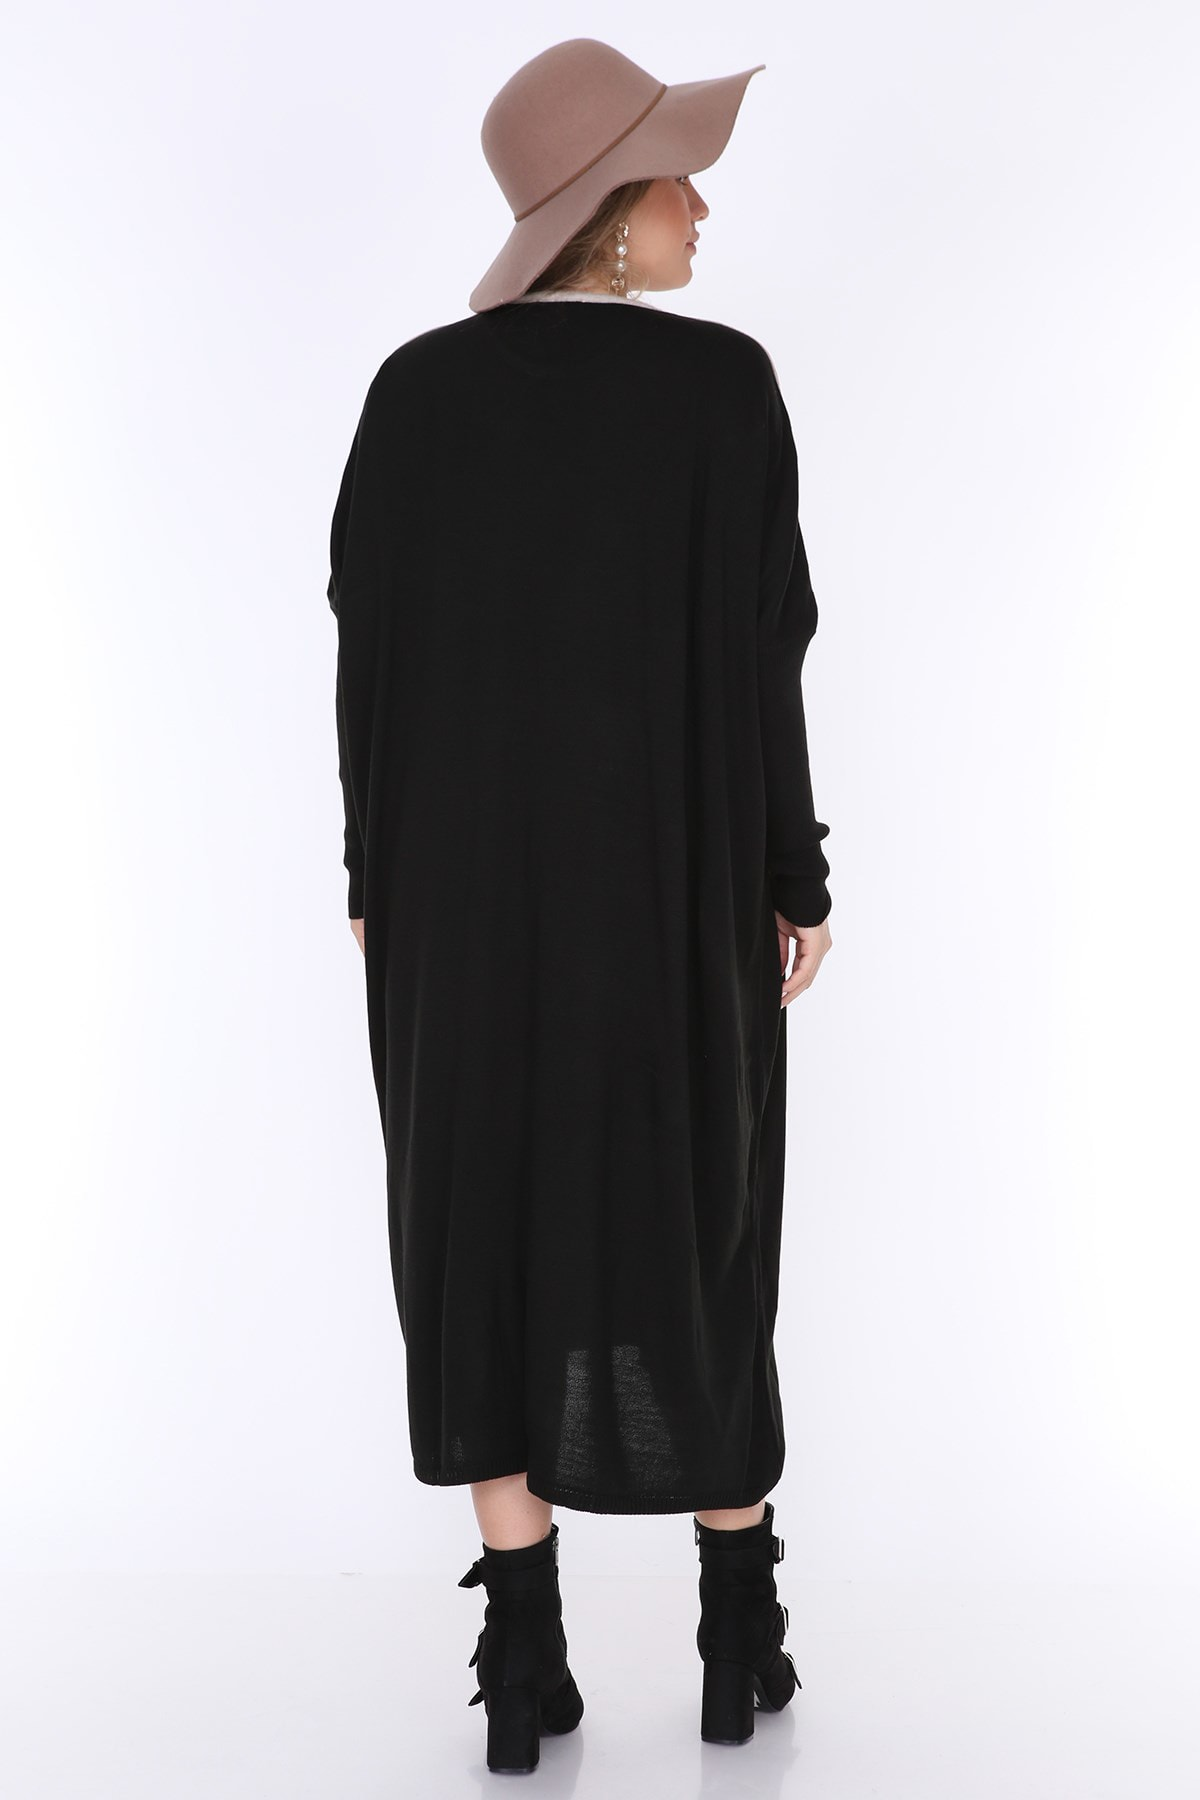 MJORA Kadın Siyah Önü V Triko Tunik ÇRG011 2